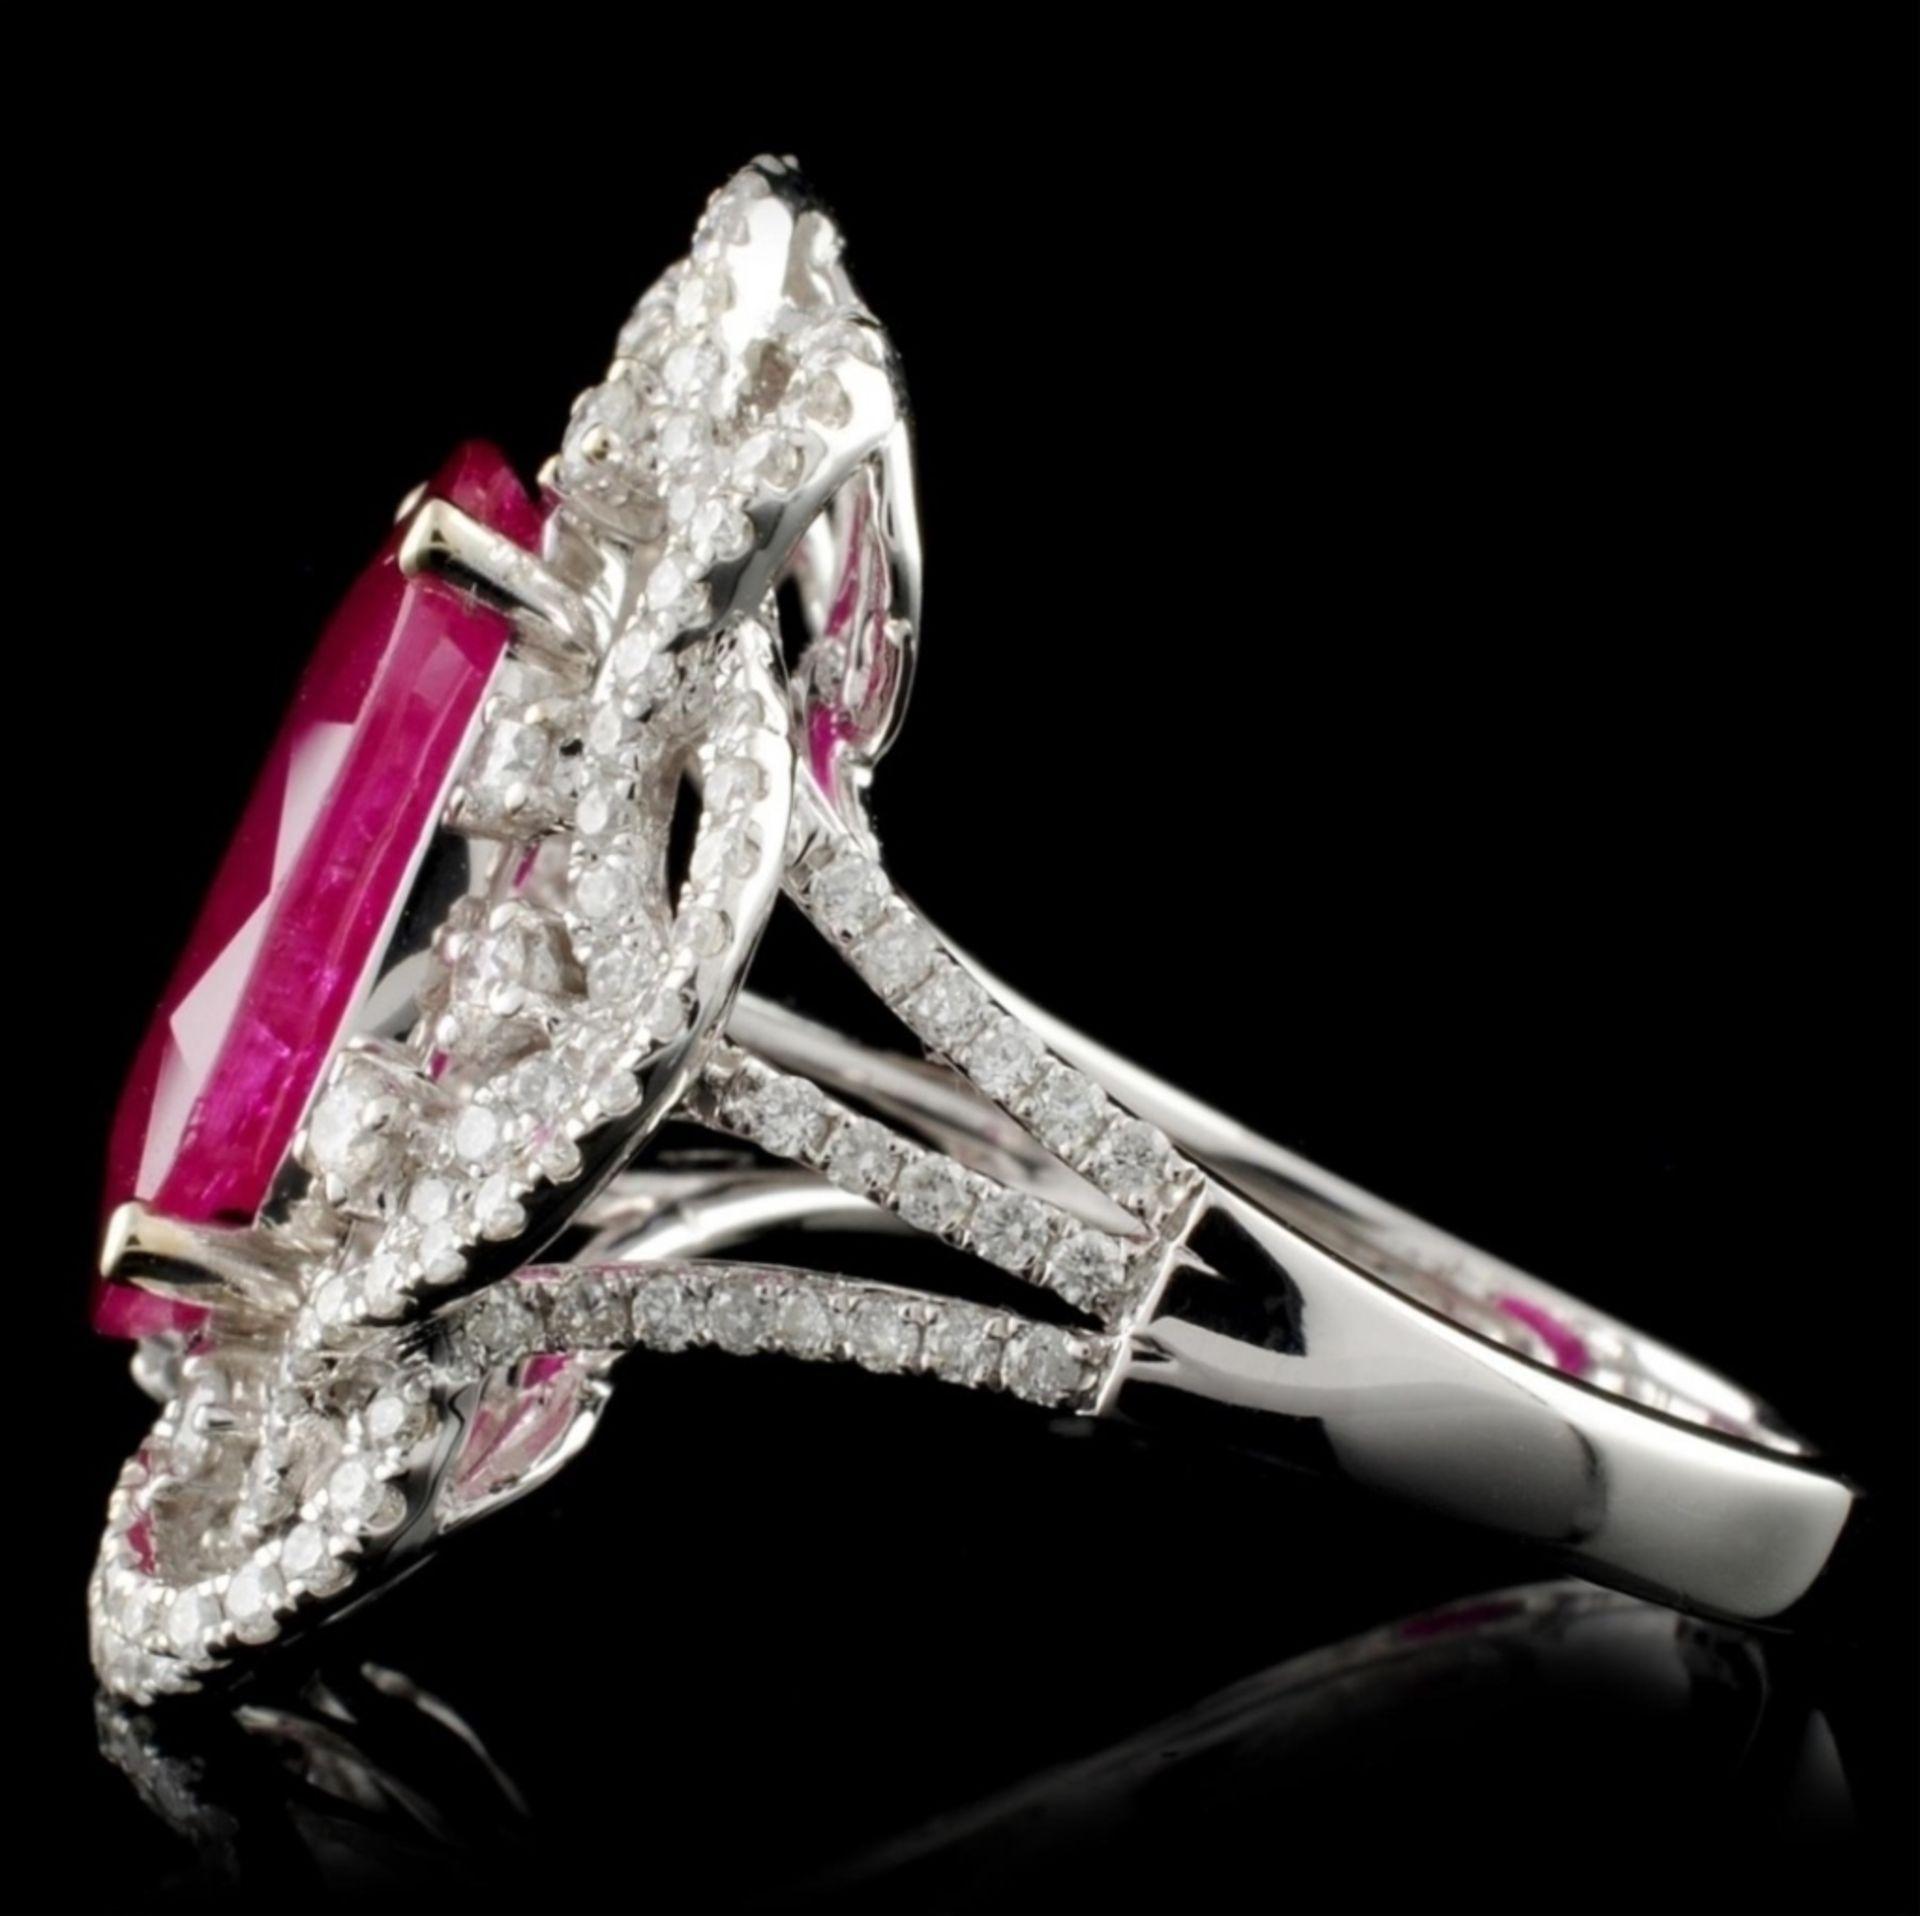 18K White Gold 6.03ct Ruby & 0.96ct Diamond Ring - Image 3 of 4